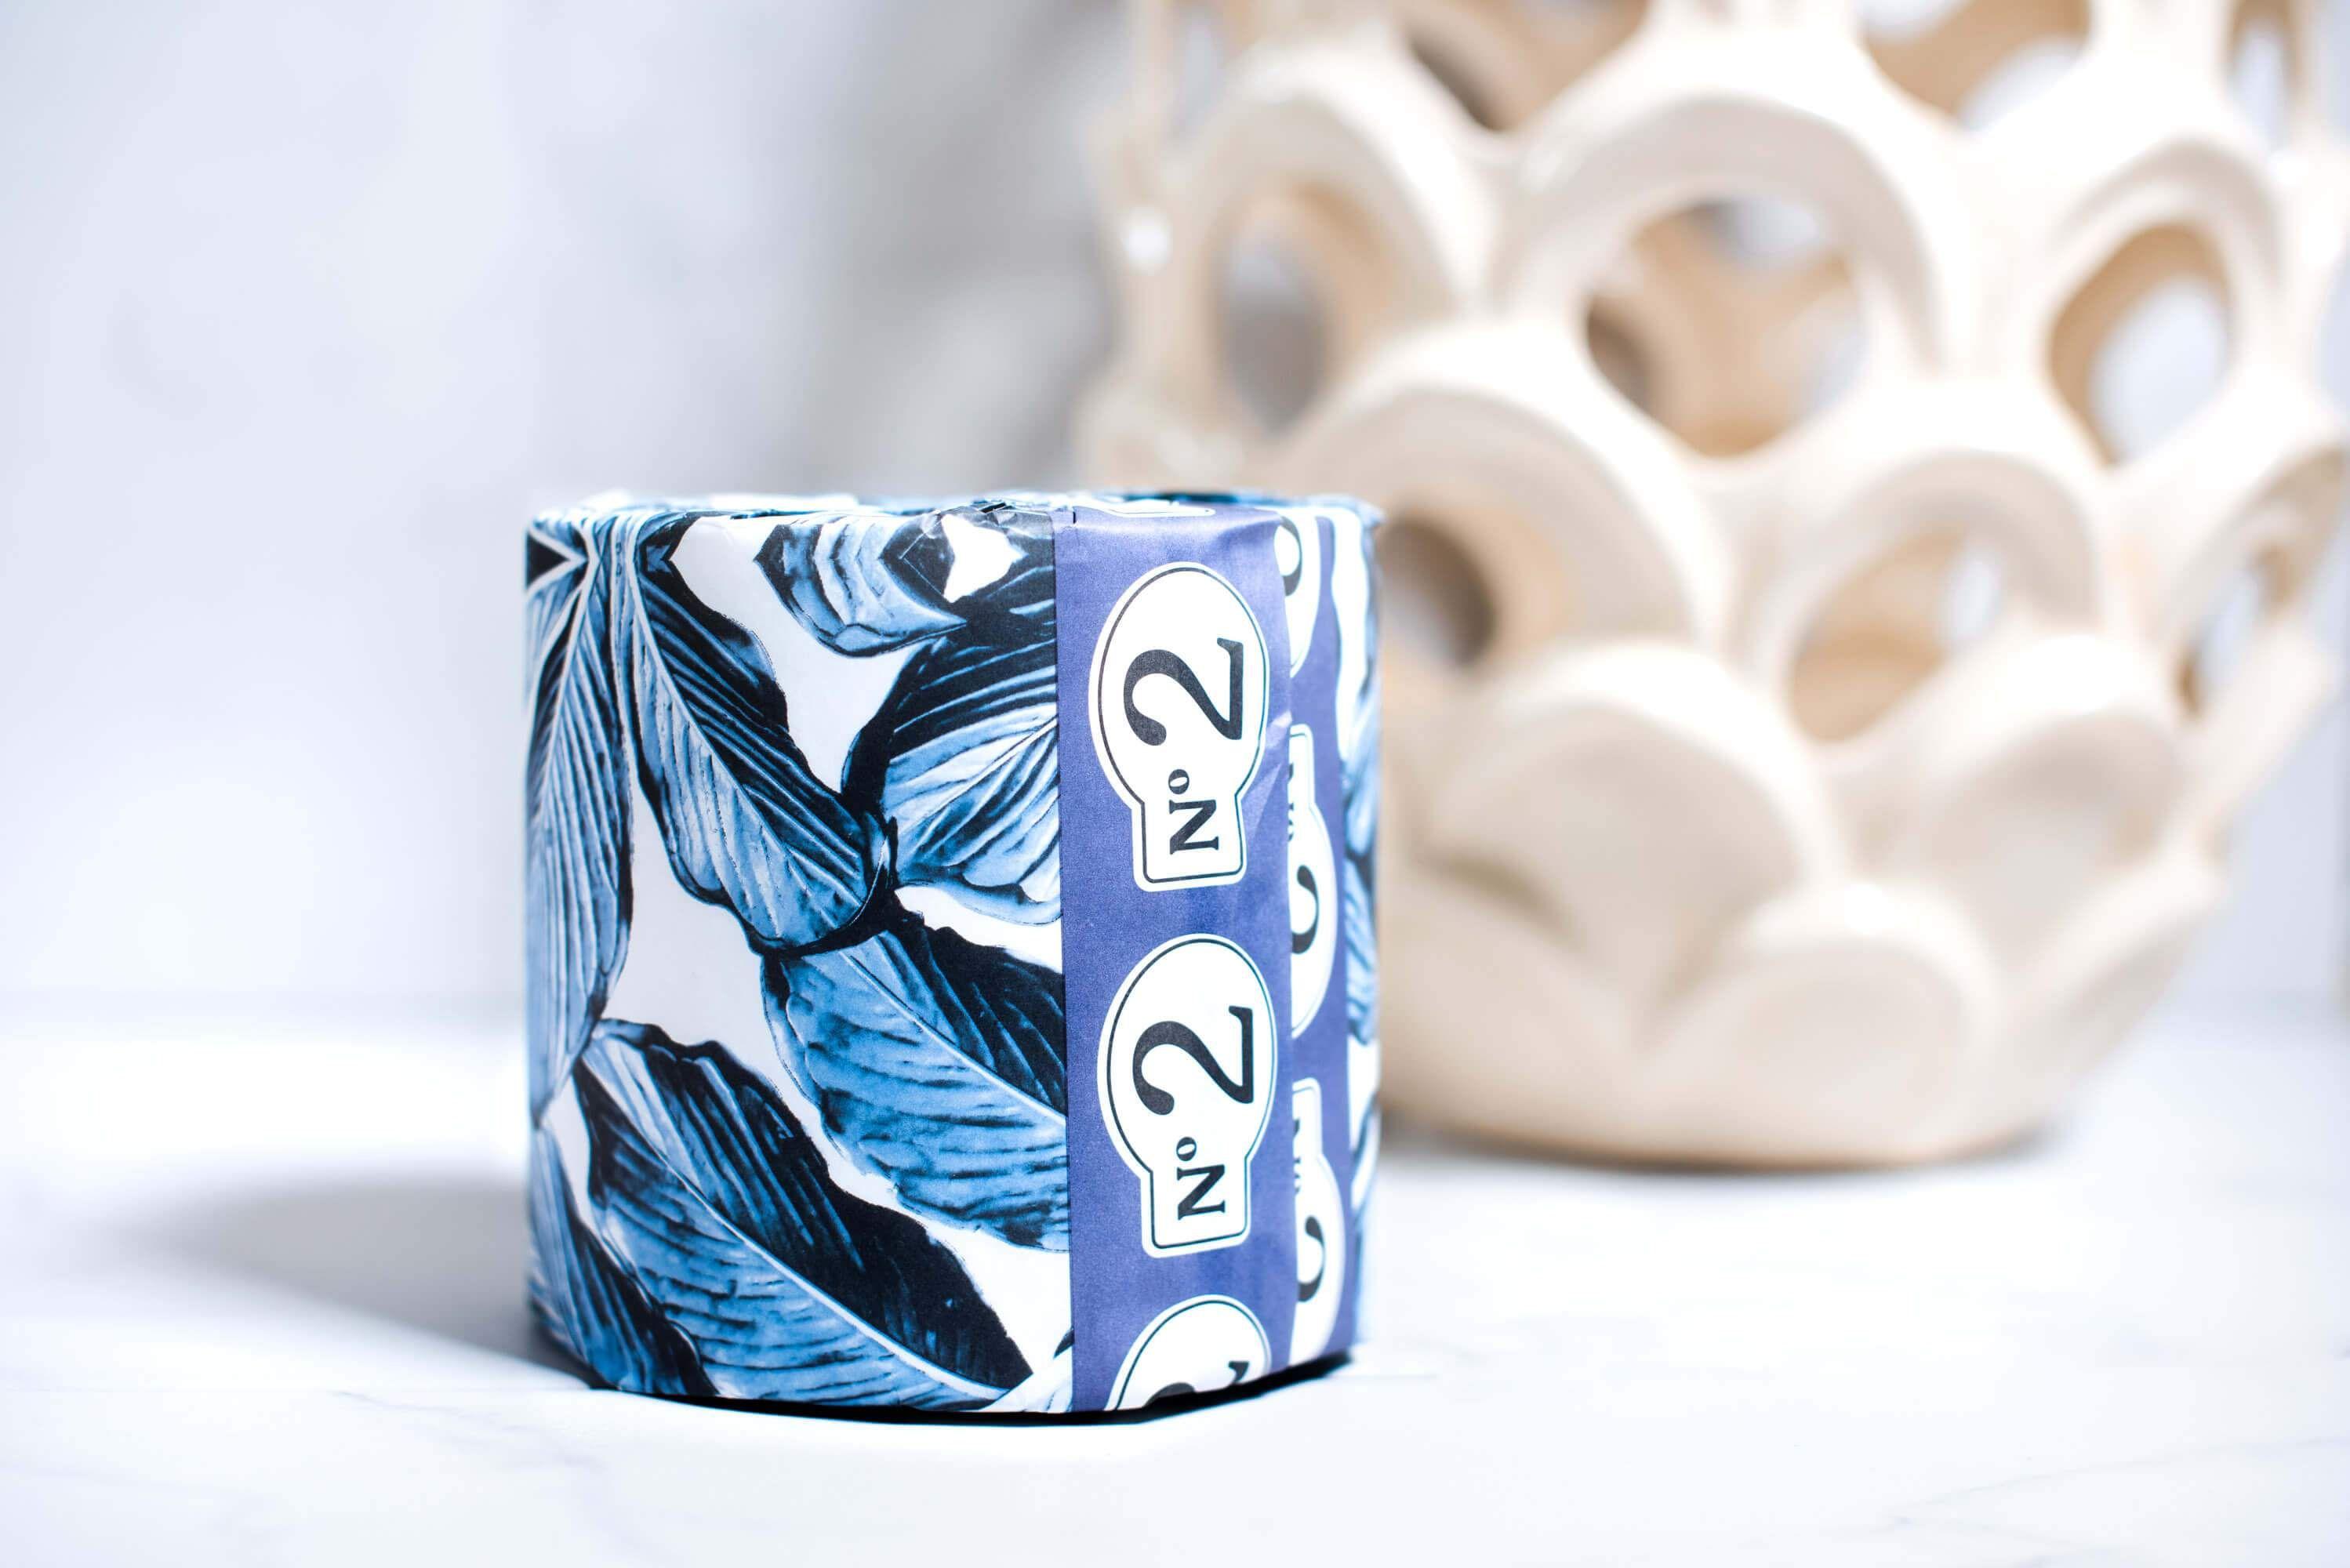 No.2 Bamboo Toilet Paper - Eco-Friendly TP - No.2 Toilet Paper